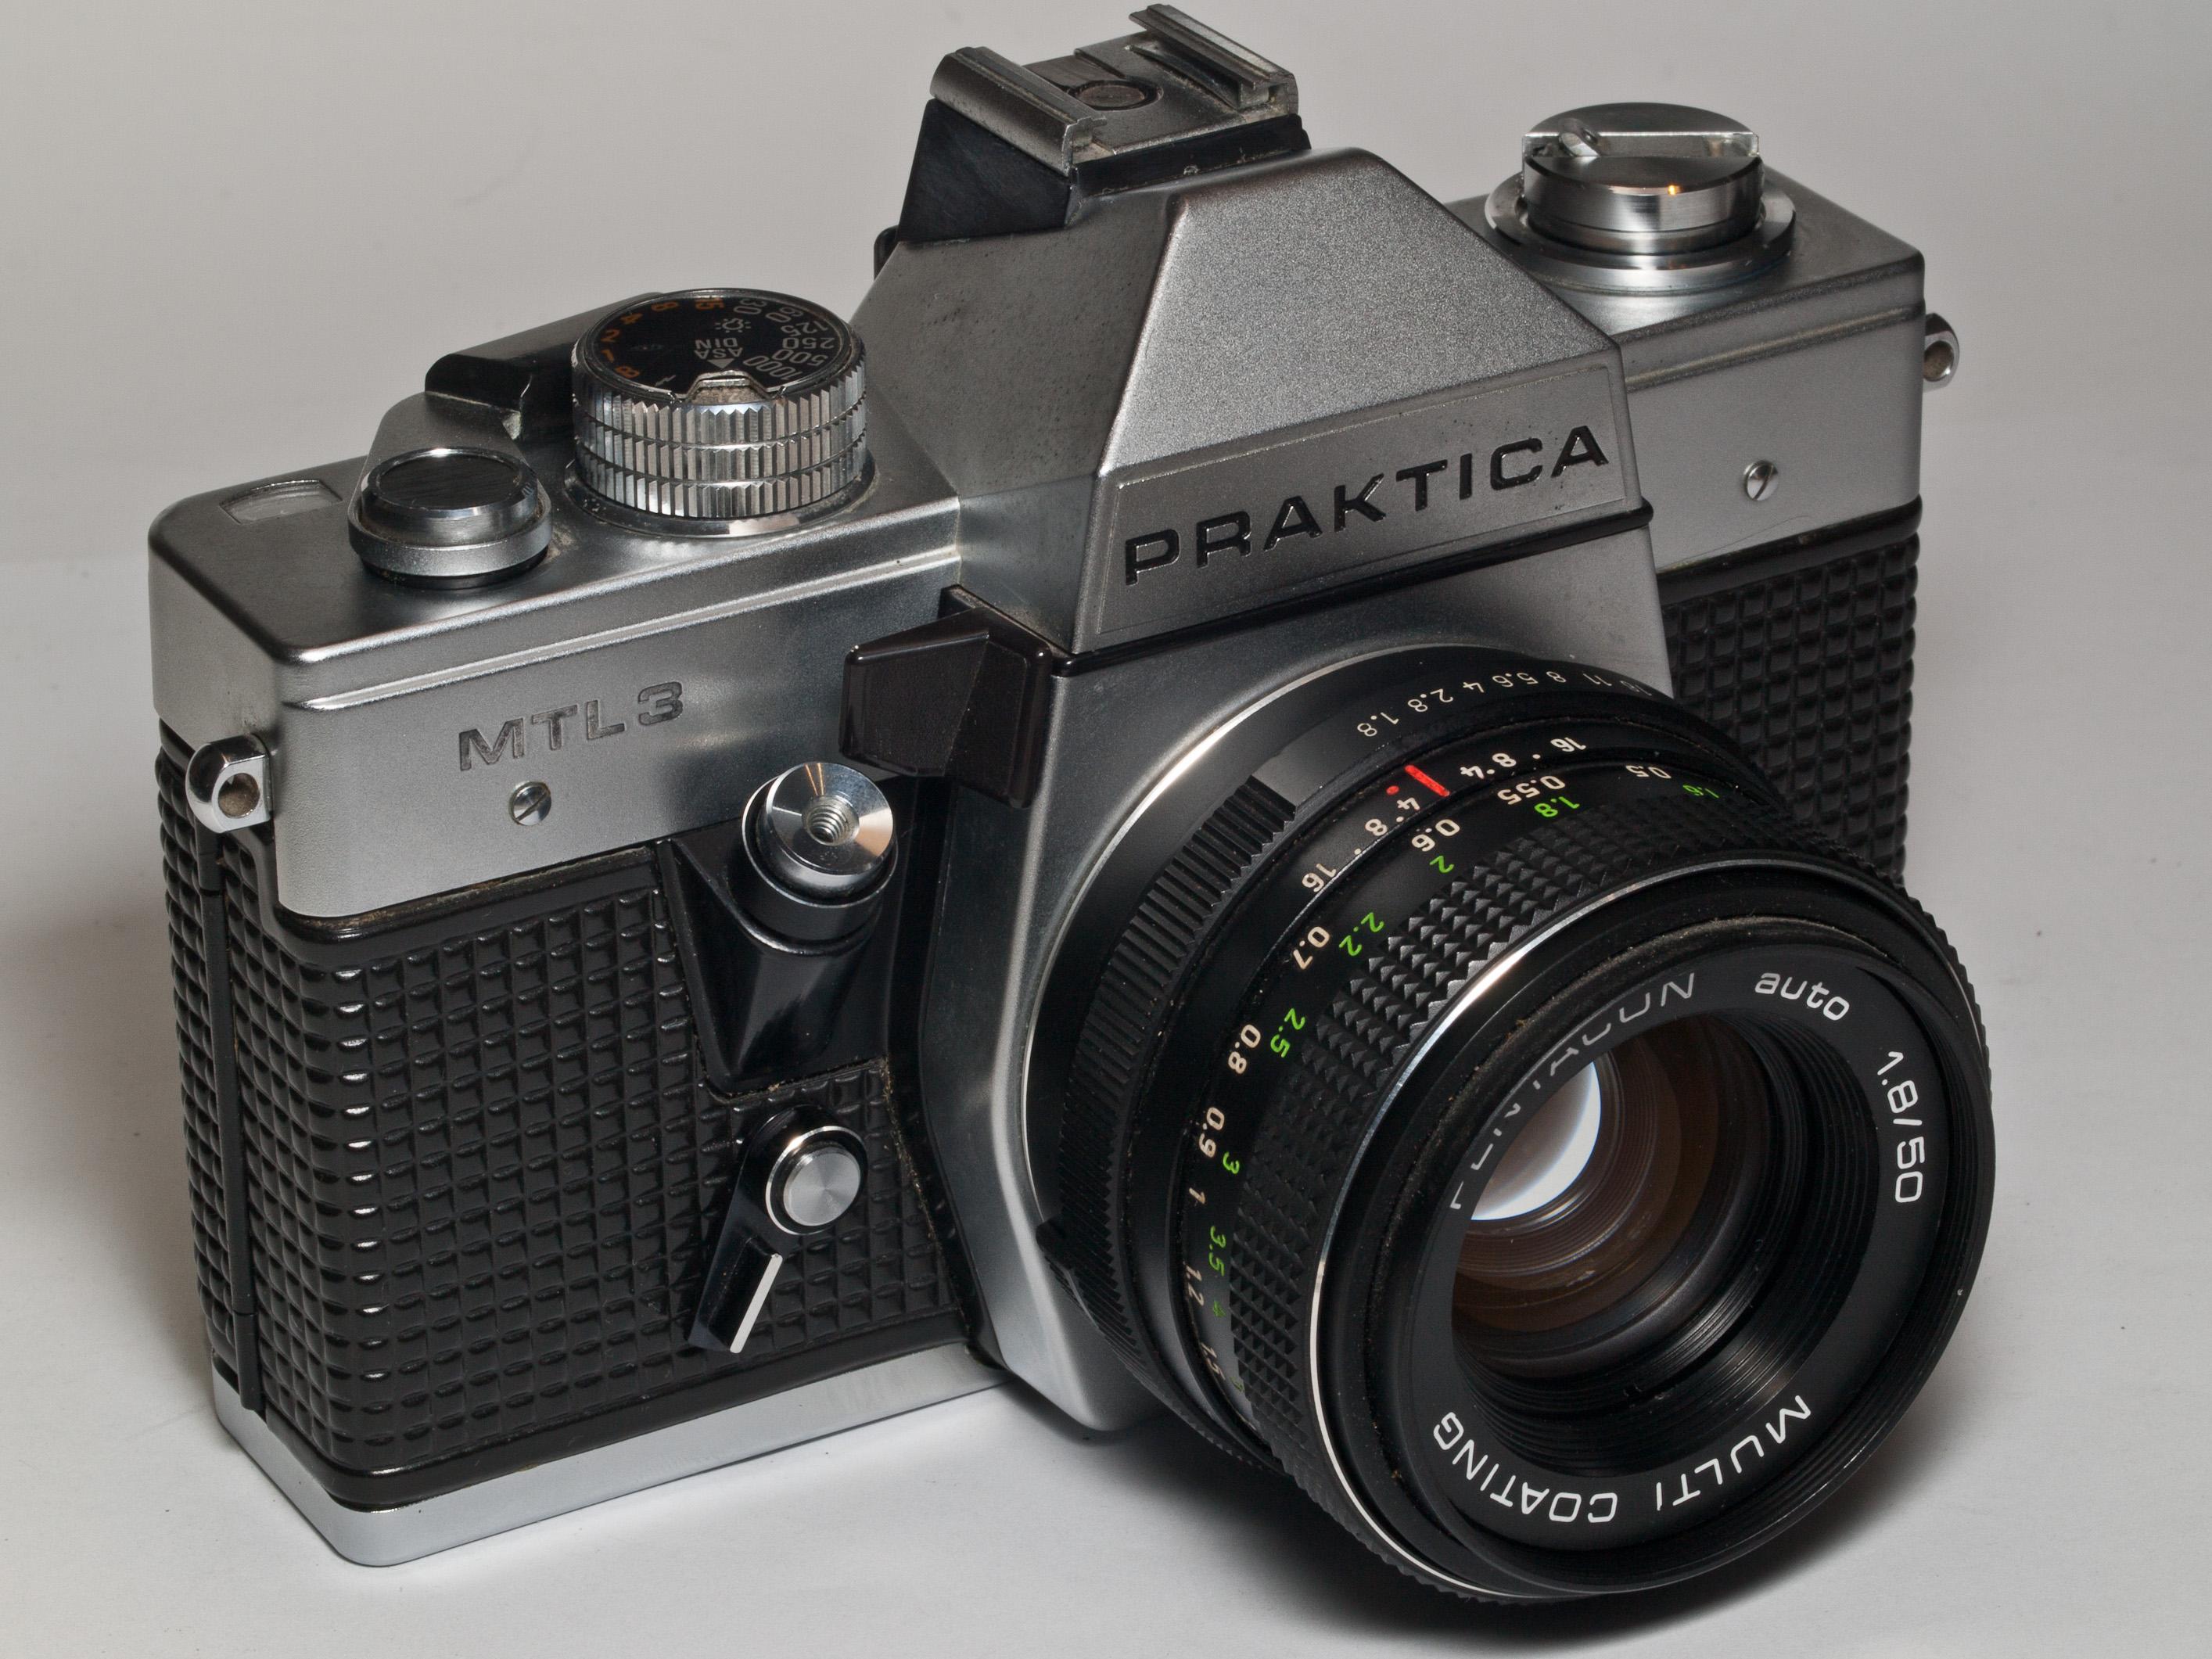 File:praktica mtl3 photo camera.jpg wikimedia commons